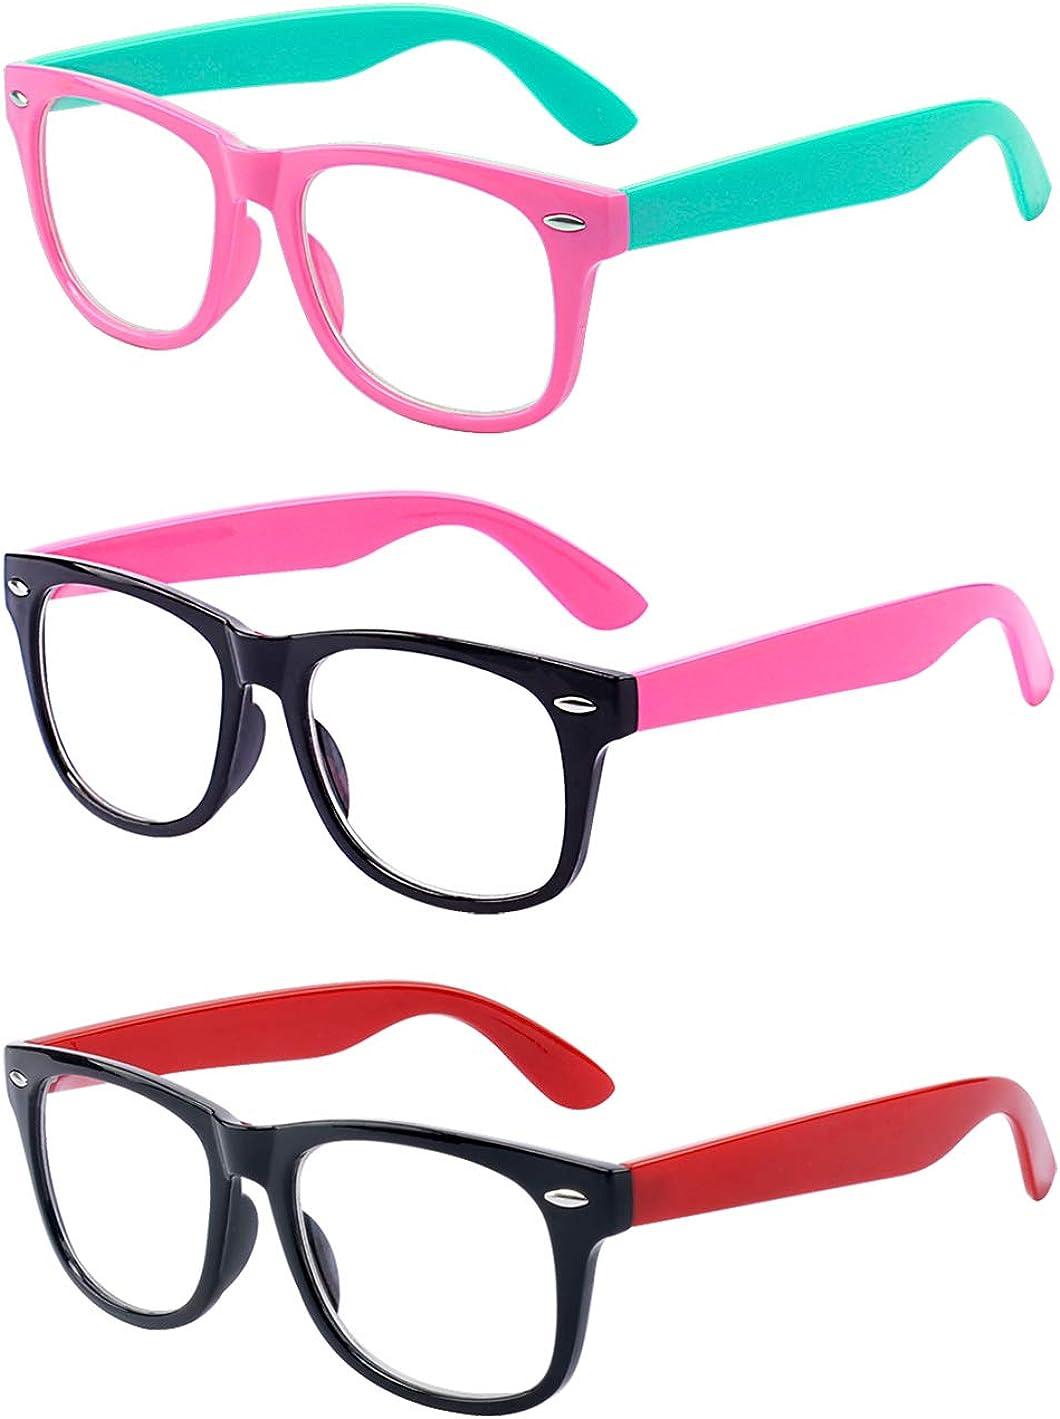 Popular Manufacturer regenerated product standard Outray 3 Pack Kids Blue Light Girls Boys 3-10 Comp Age Glasses